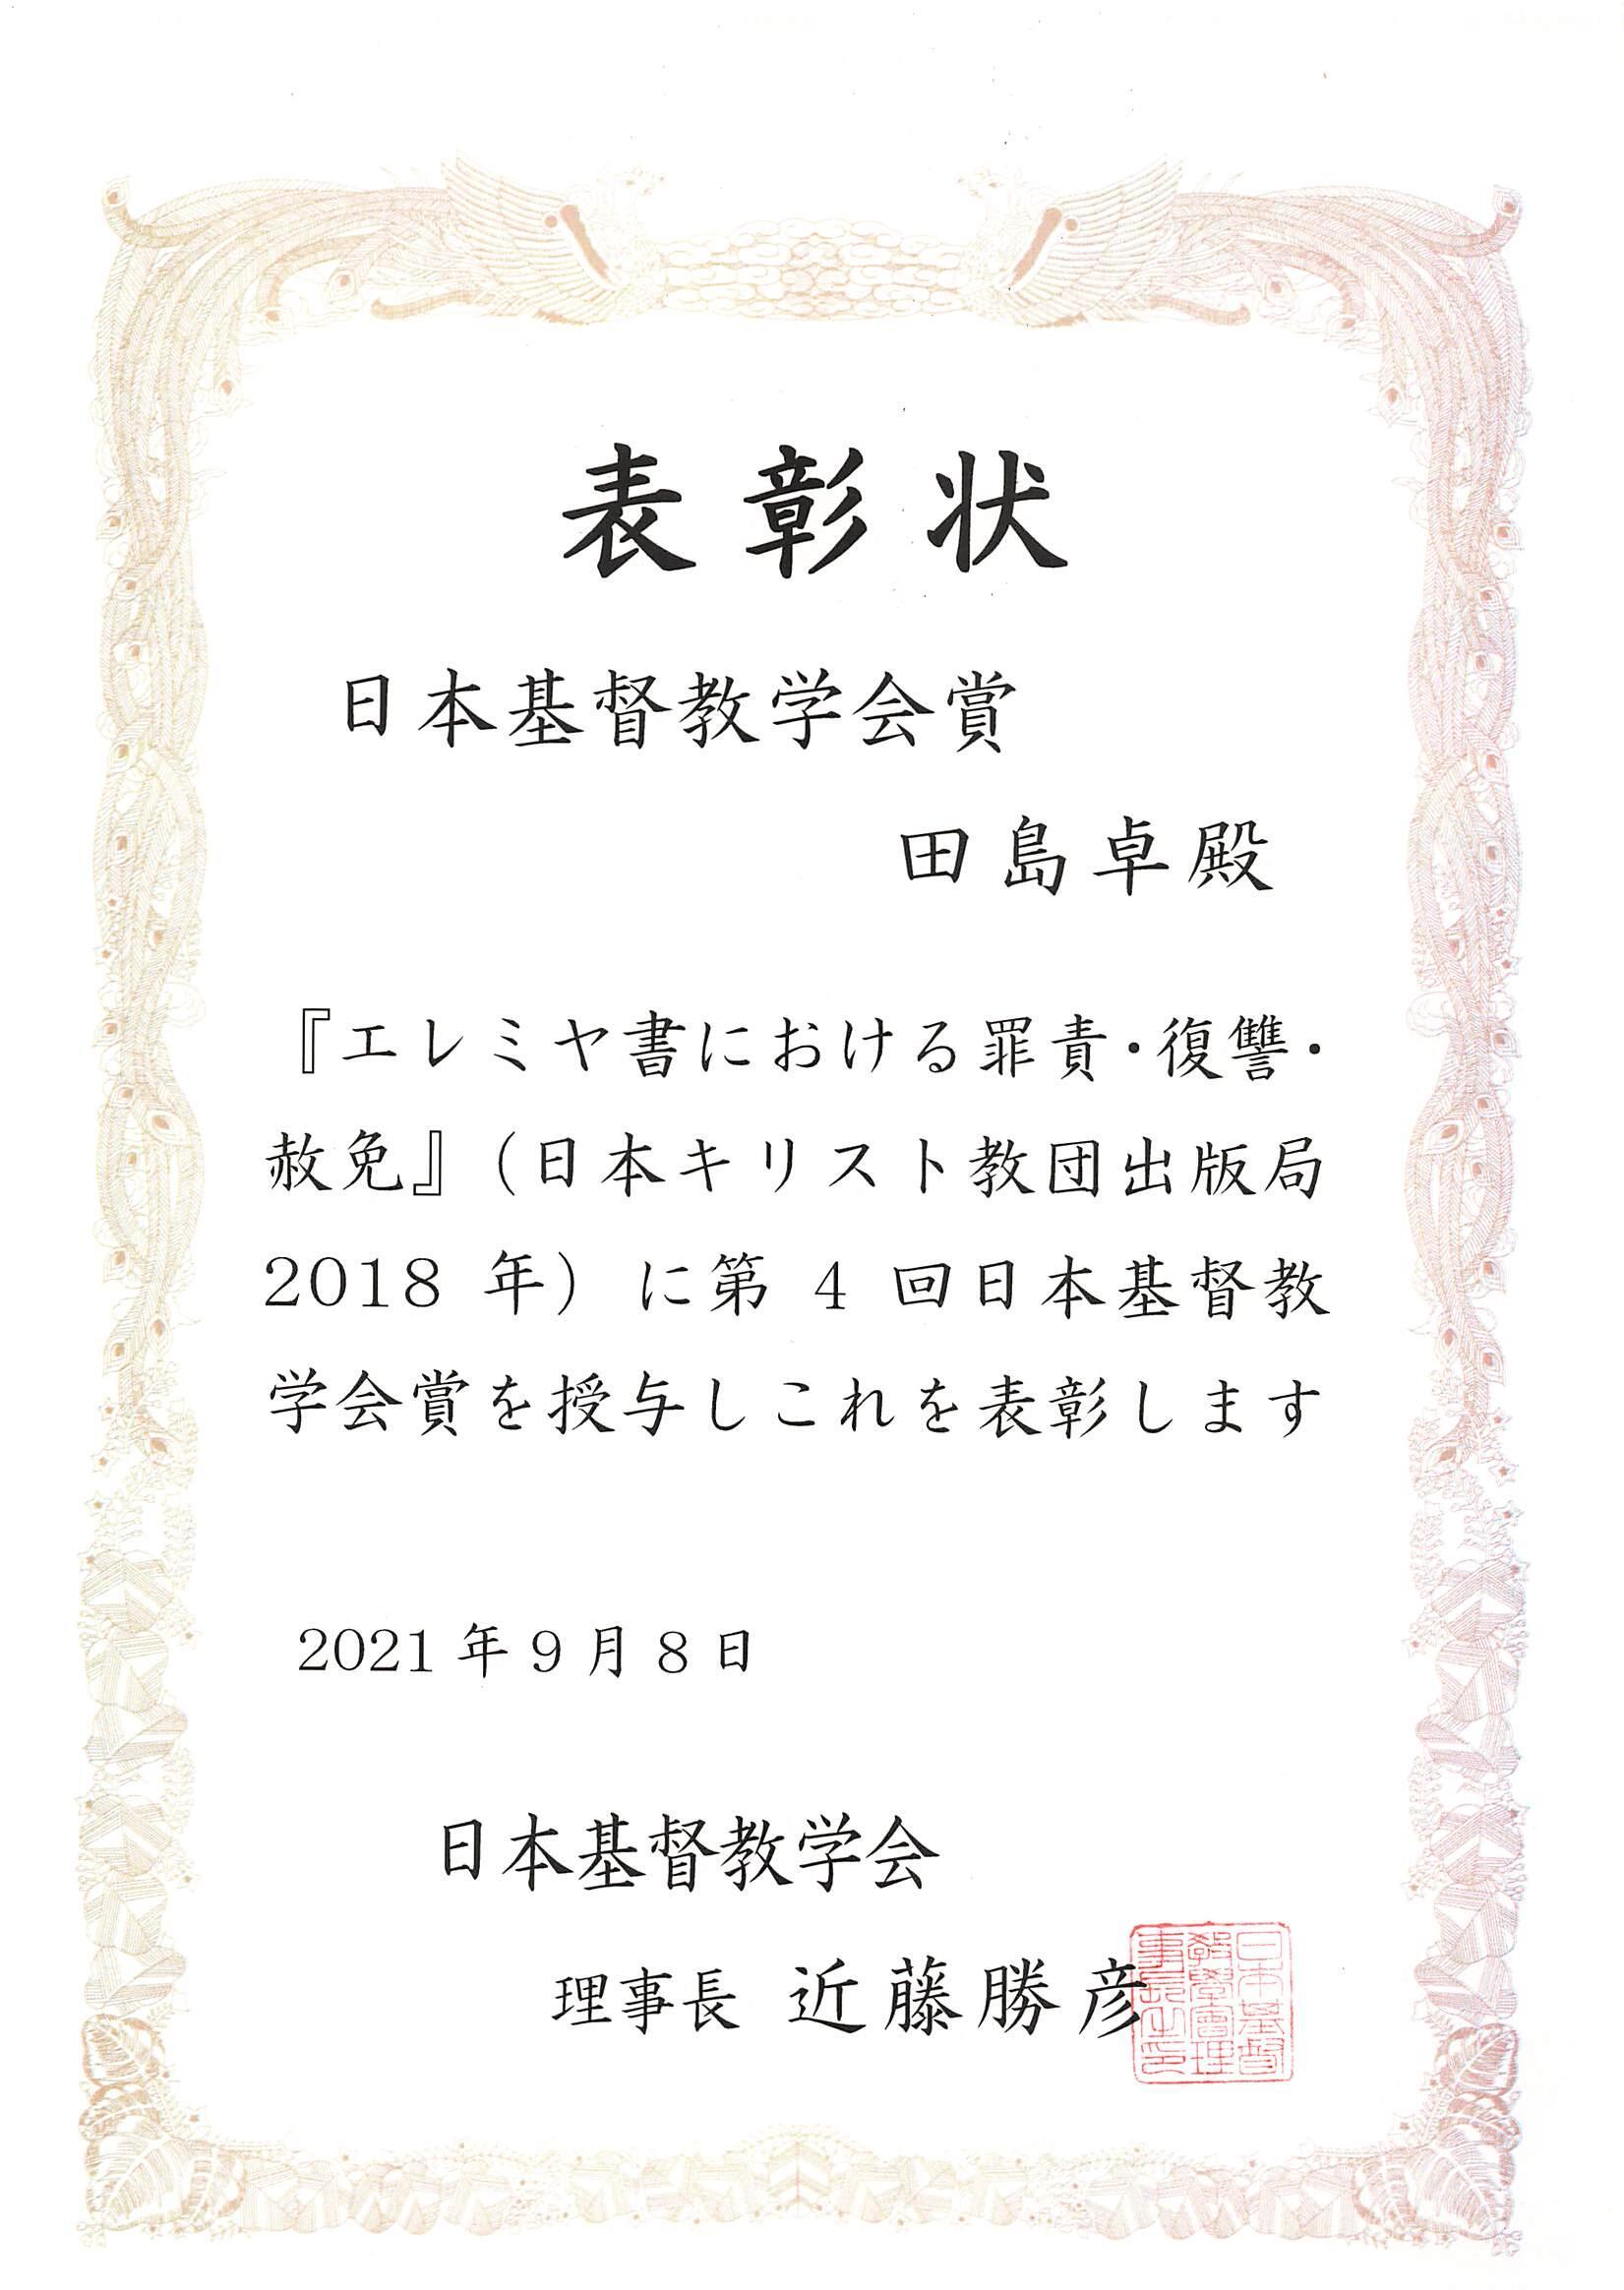 https://www.tohoku-gakuin.ac.jp/info/content/210913-3_2.jpg